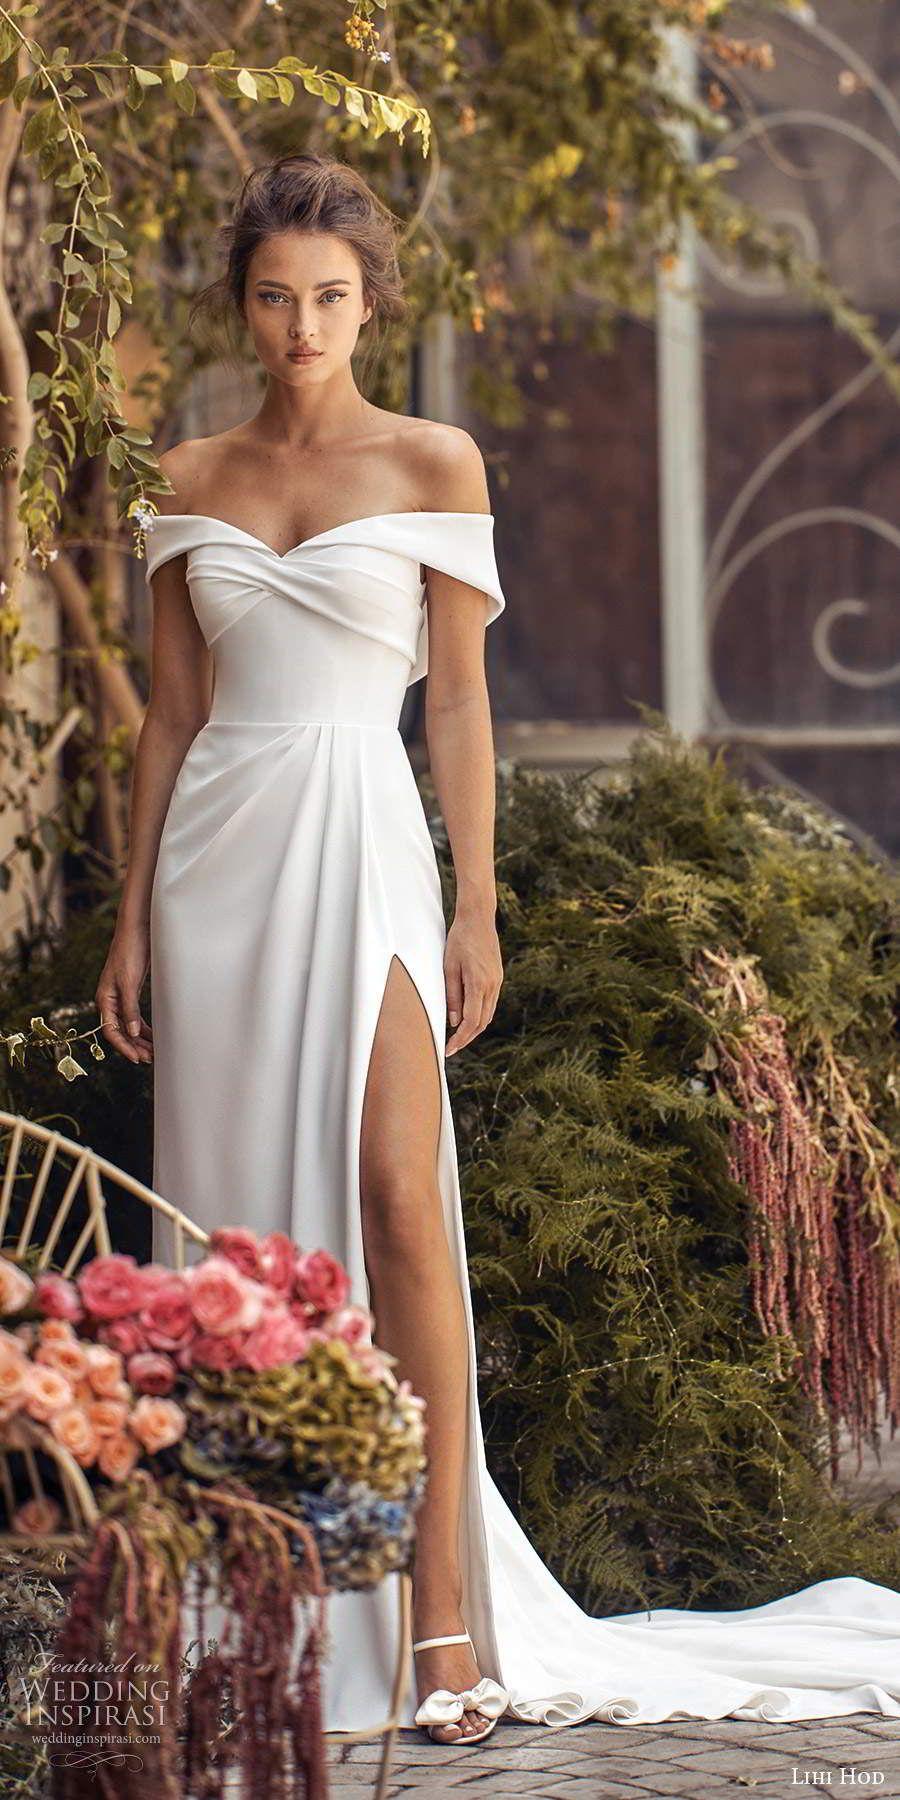 Lihi Hod Fall 2020 Wedding Dresses White Blossom Bridal Collection Wedding Inspirasi Column Wedding Dress Wedding Dresses Wedding Dress Guide [ 1800 x 900 Pixel ]